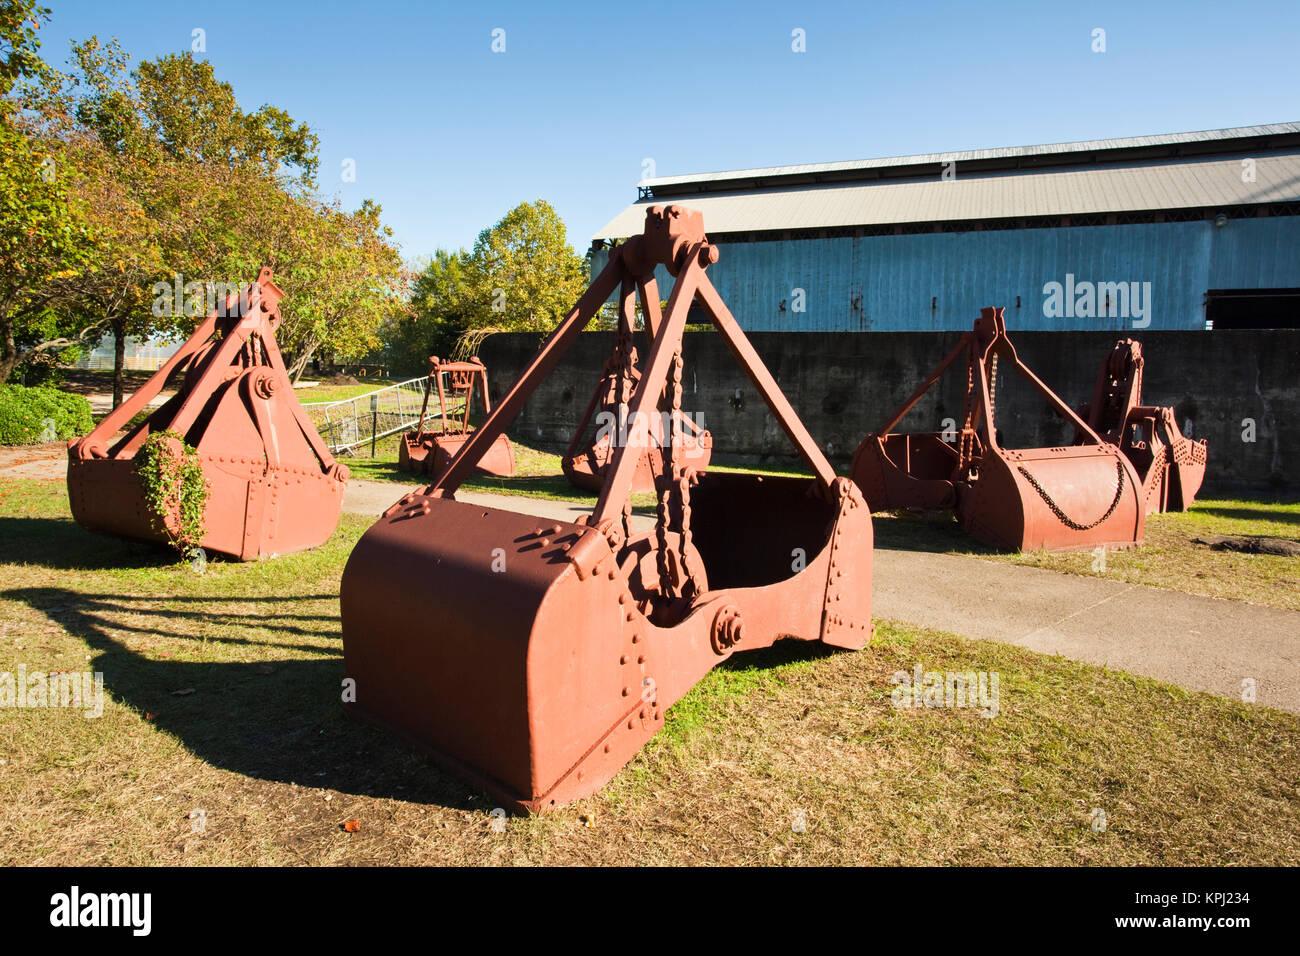 USA, Alabama, Birmingham. Sloss Furnaces National Historic Landmark, late 19th to mid 20th century blast furnace, - Stock Image